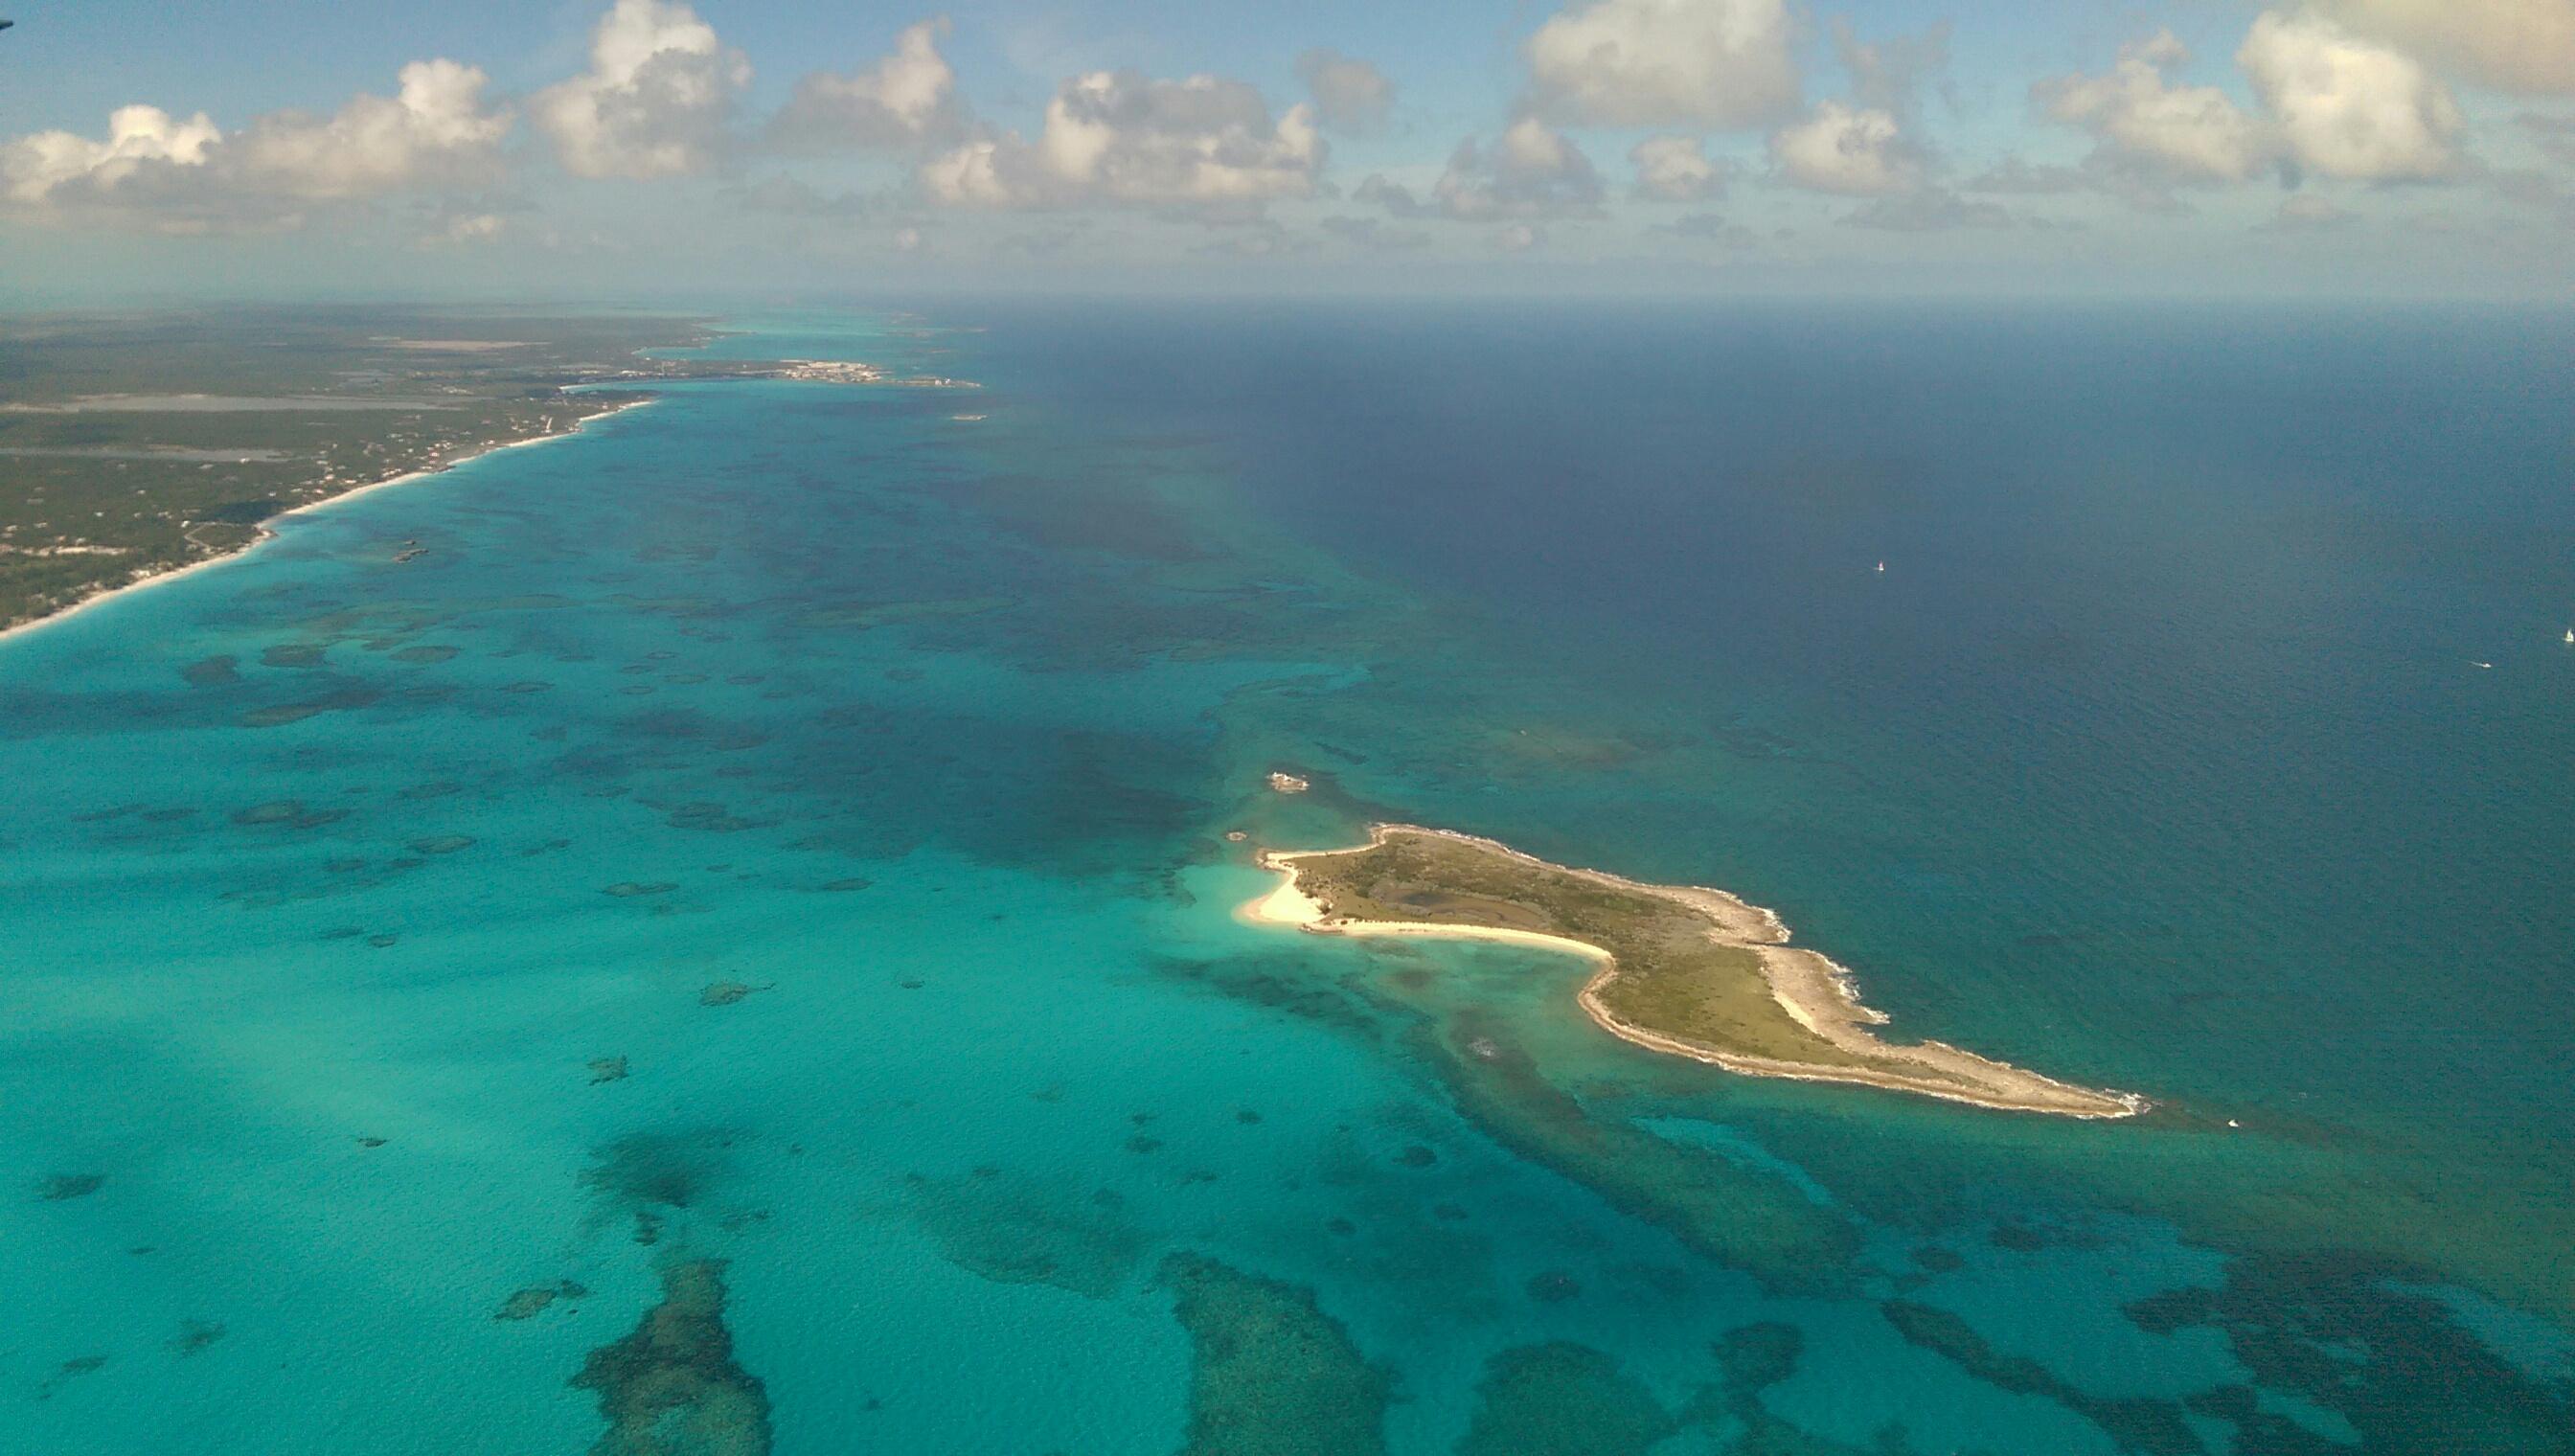 Bahamas Elevation Map.Elevation Of Exuma The Bahamas Topographic Map Altitude Map